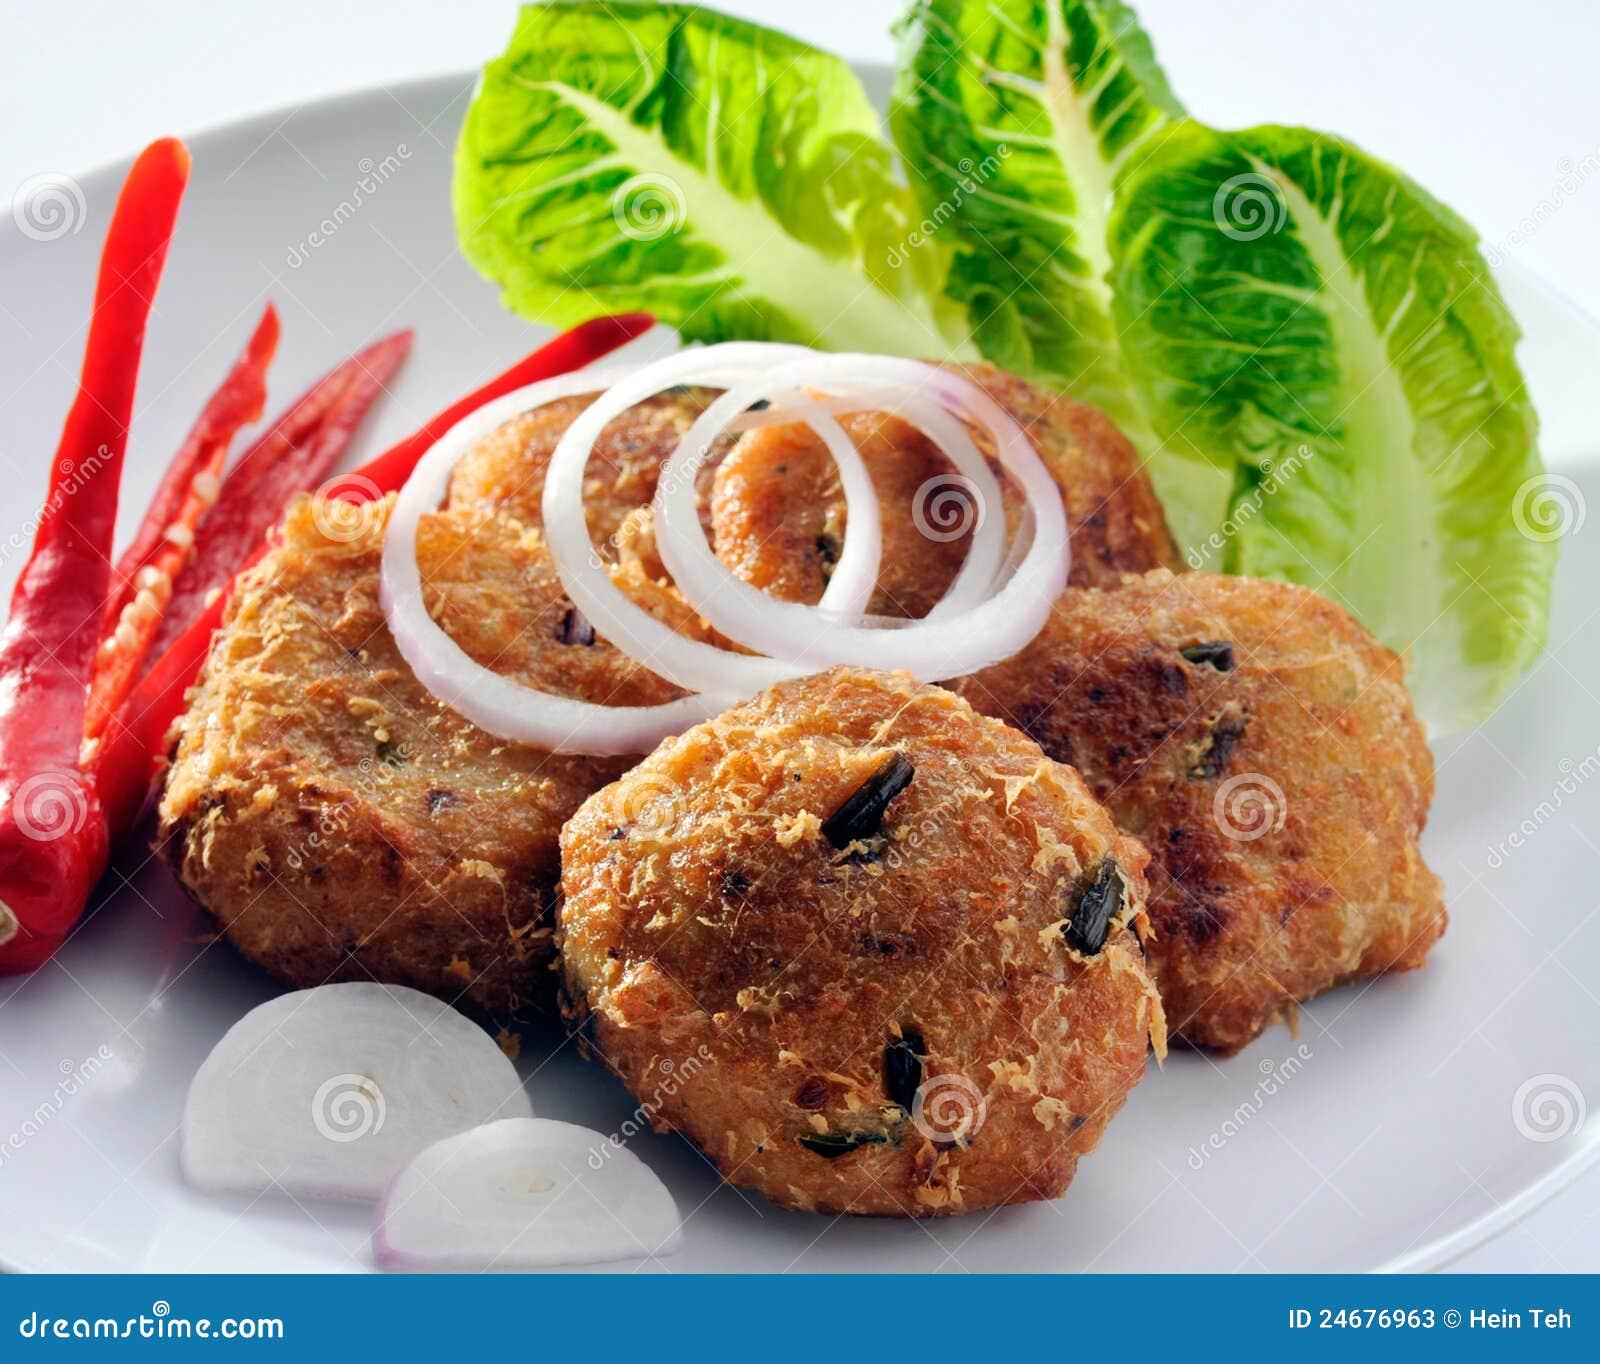 Crispy fried fish thai style